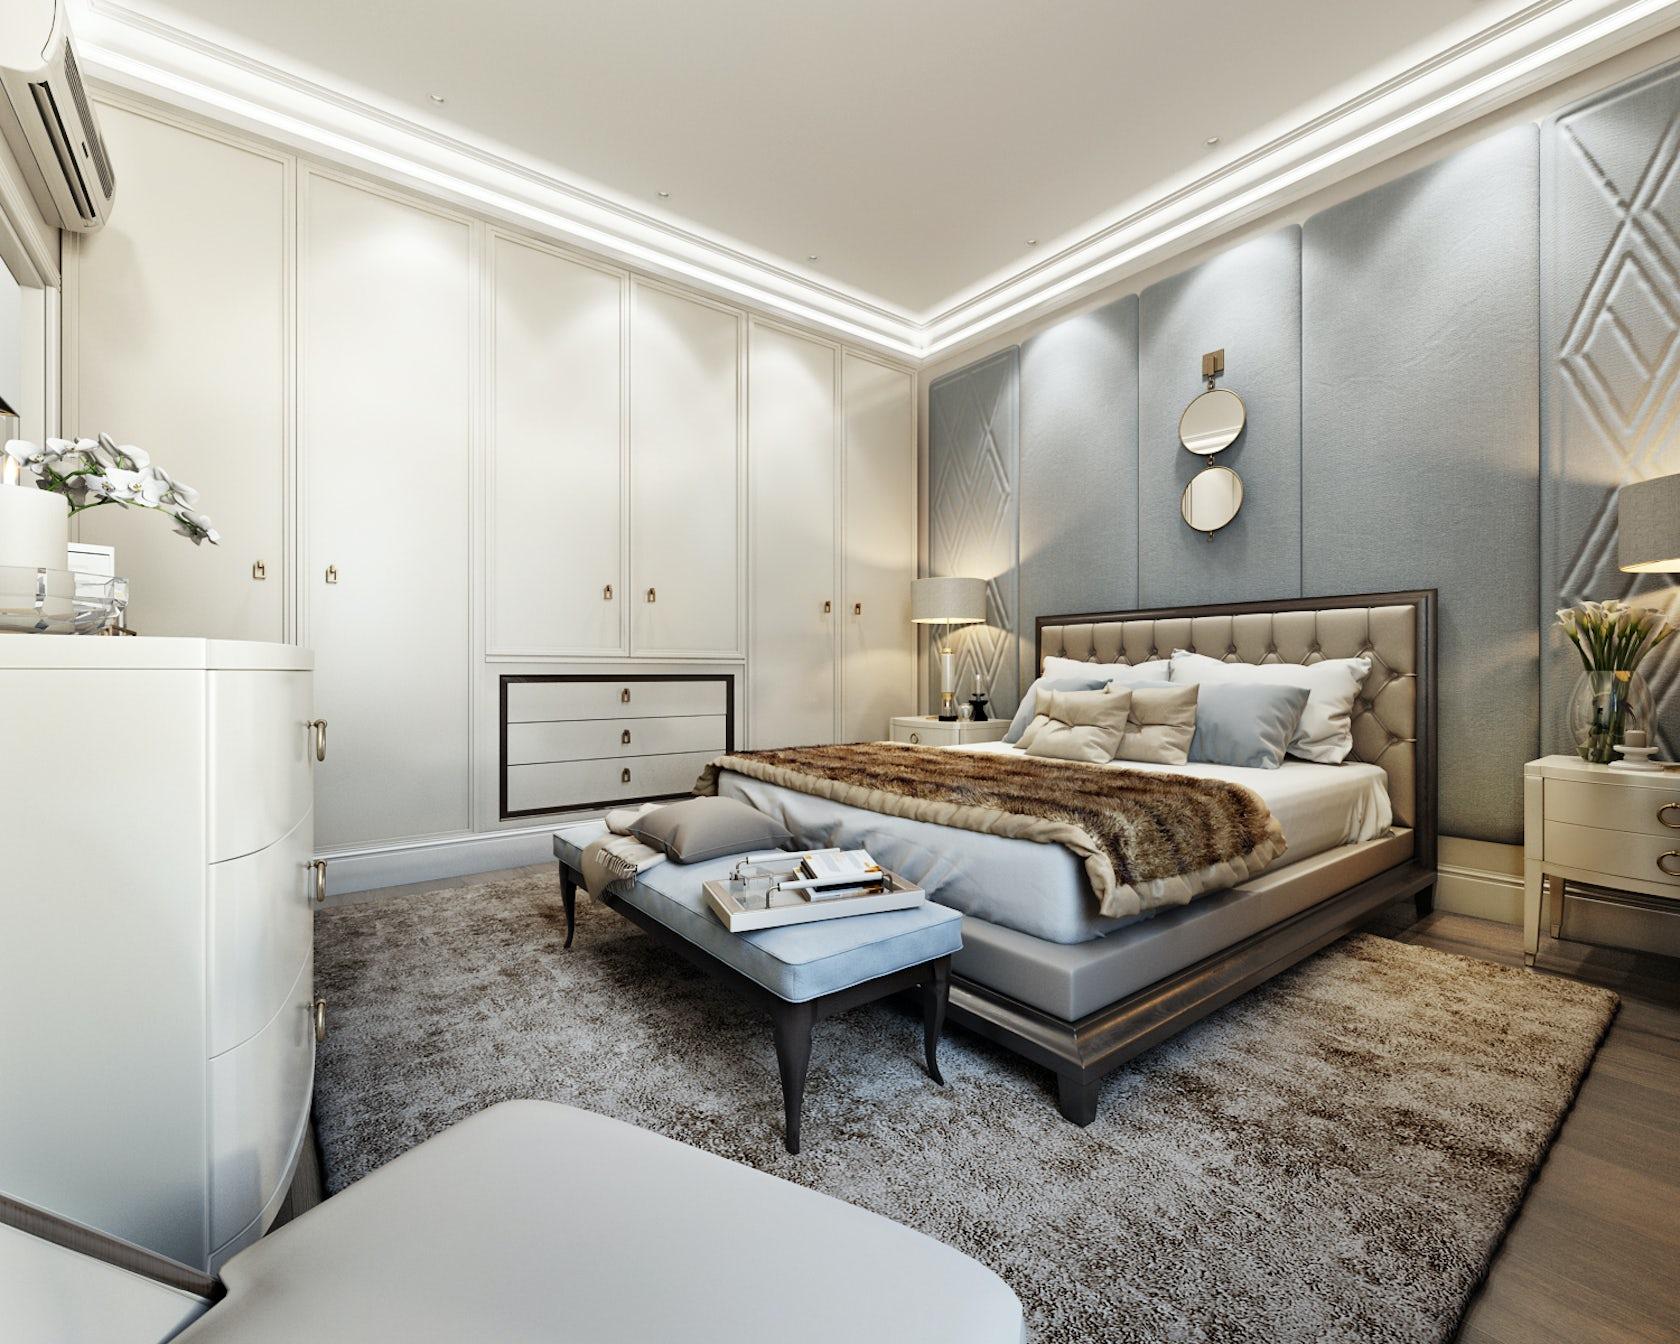 Renders 3d For Master Bedroom Project: Bedroom 3d Render For Fort Worth Project